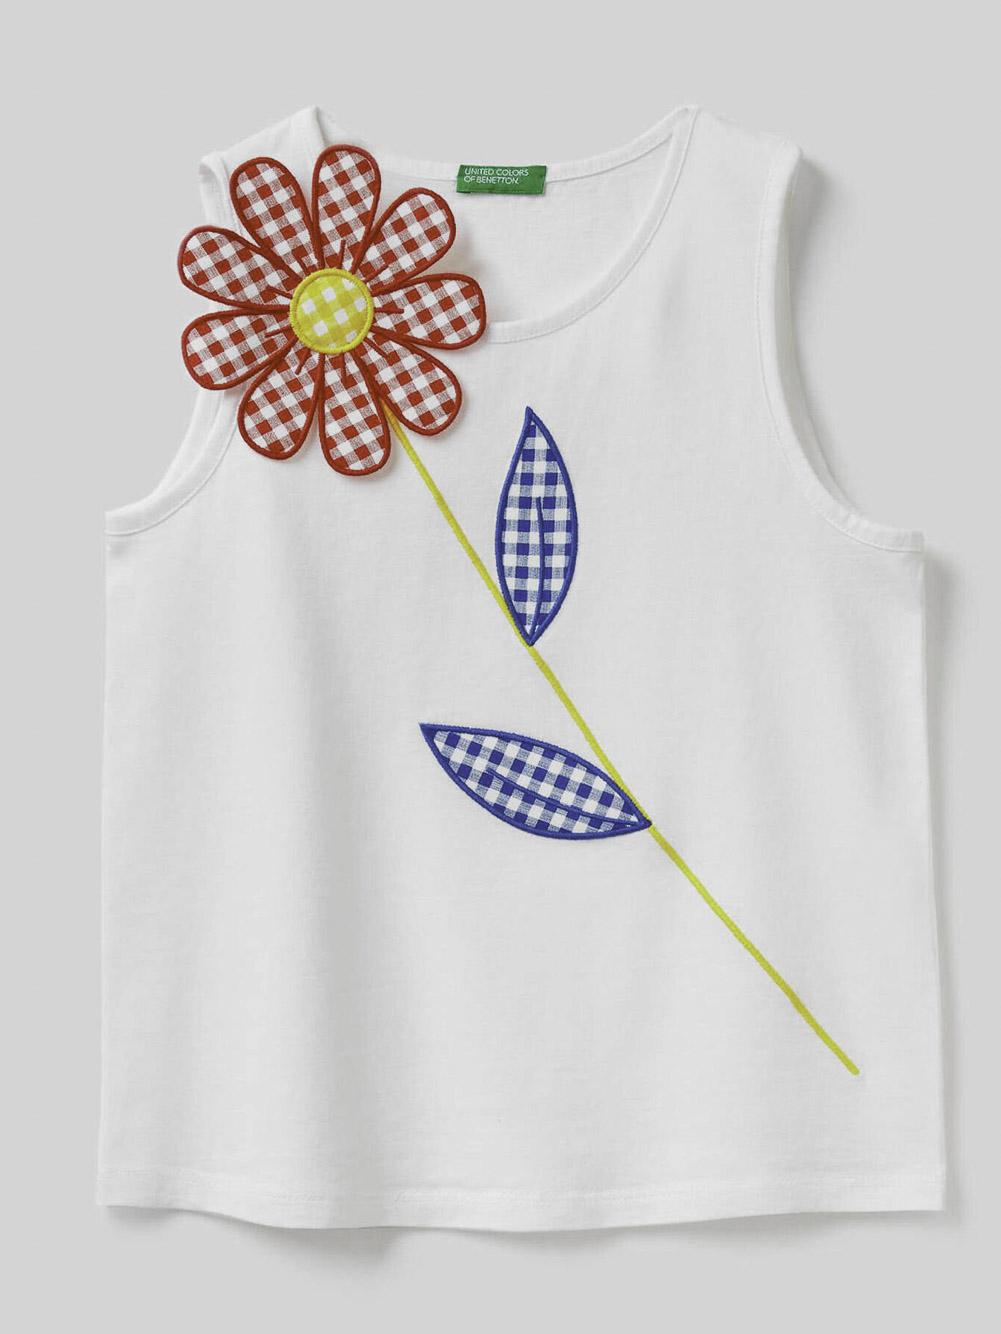 012 BENETTON Μπλούζα t-shirt 3096C8257 20P101